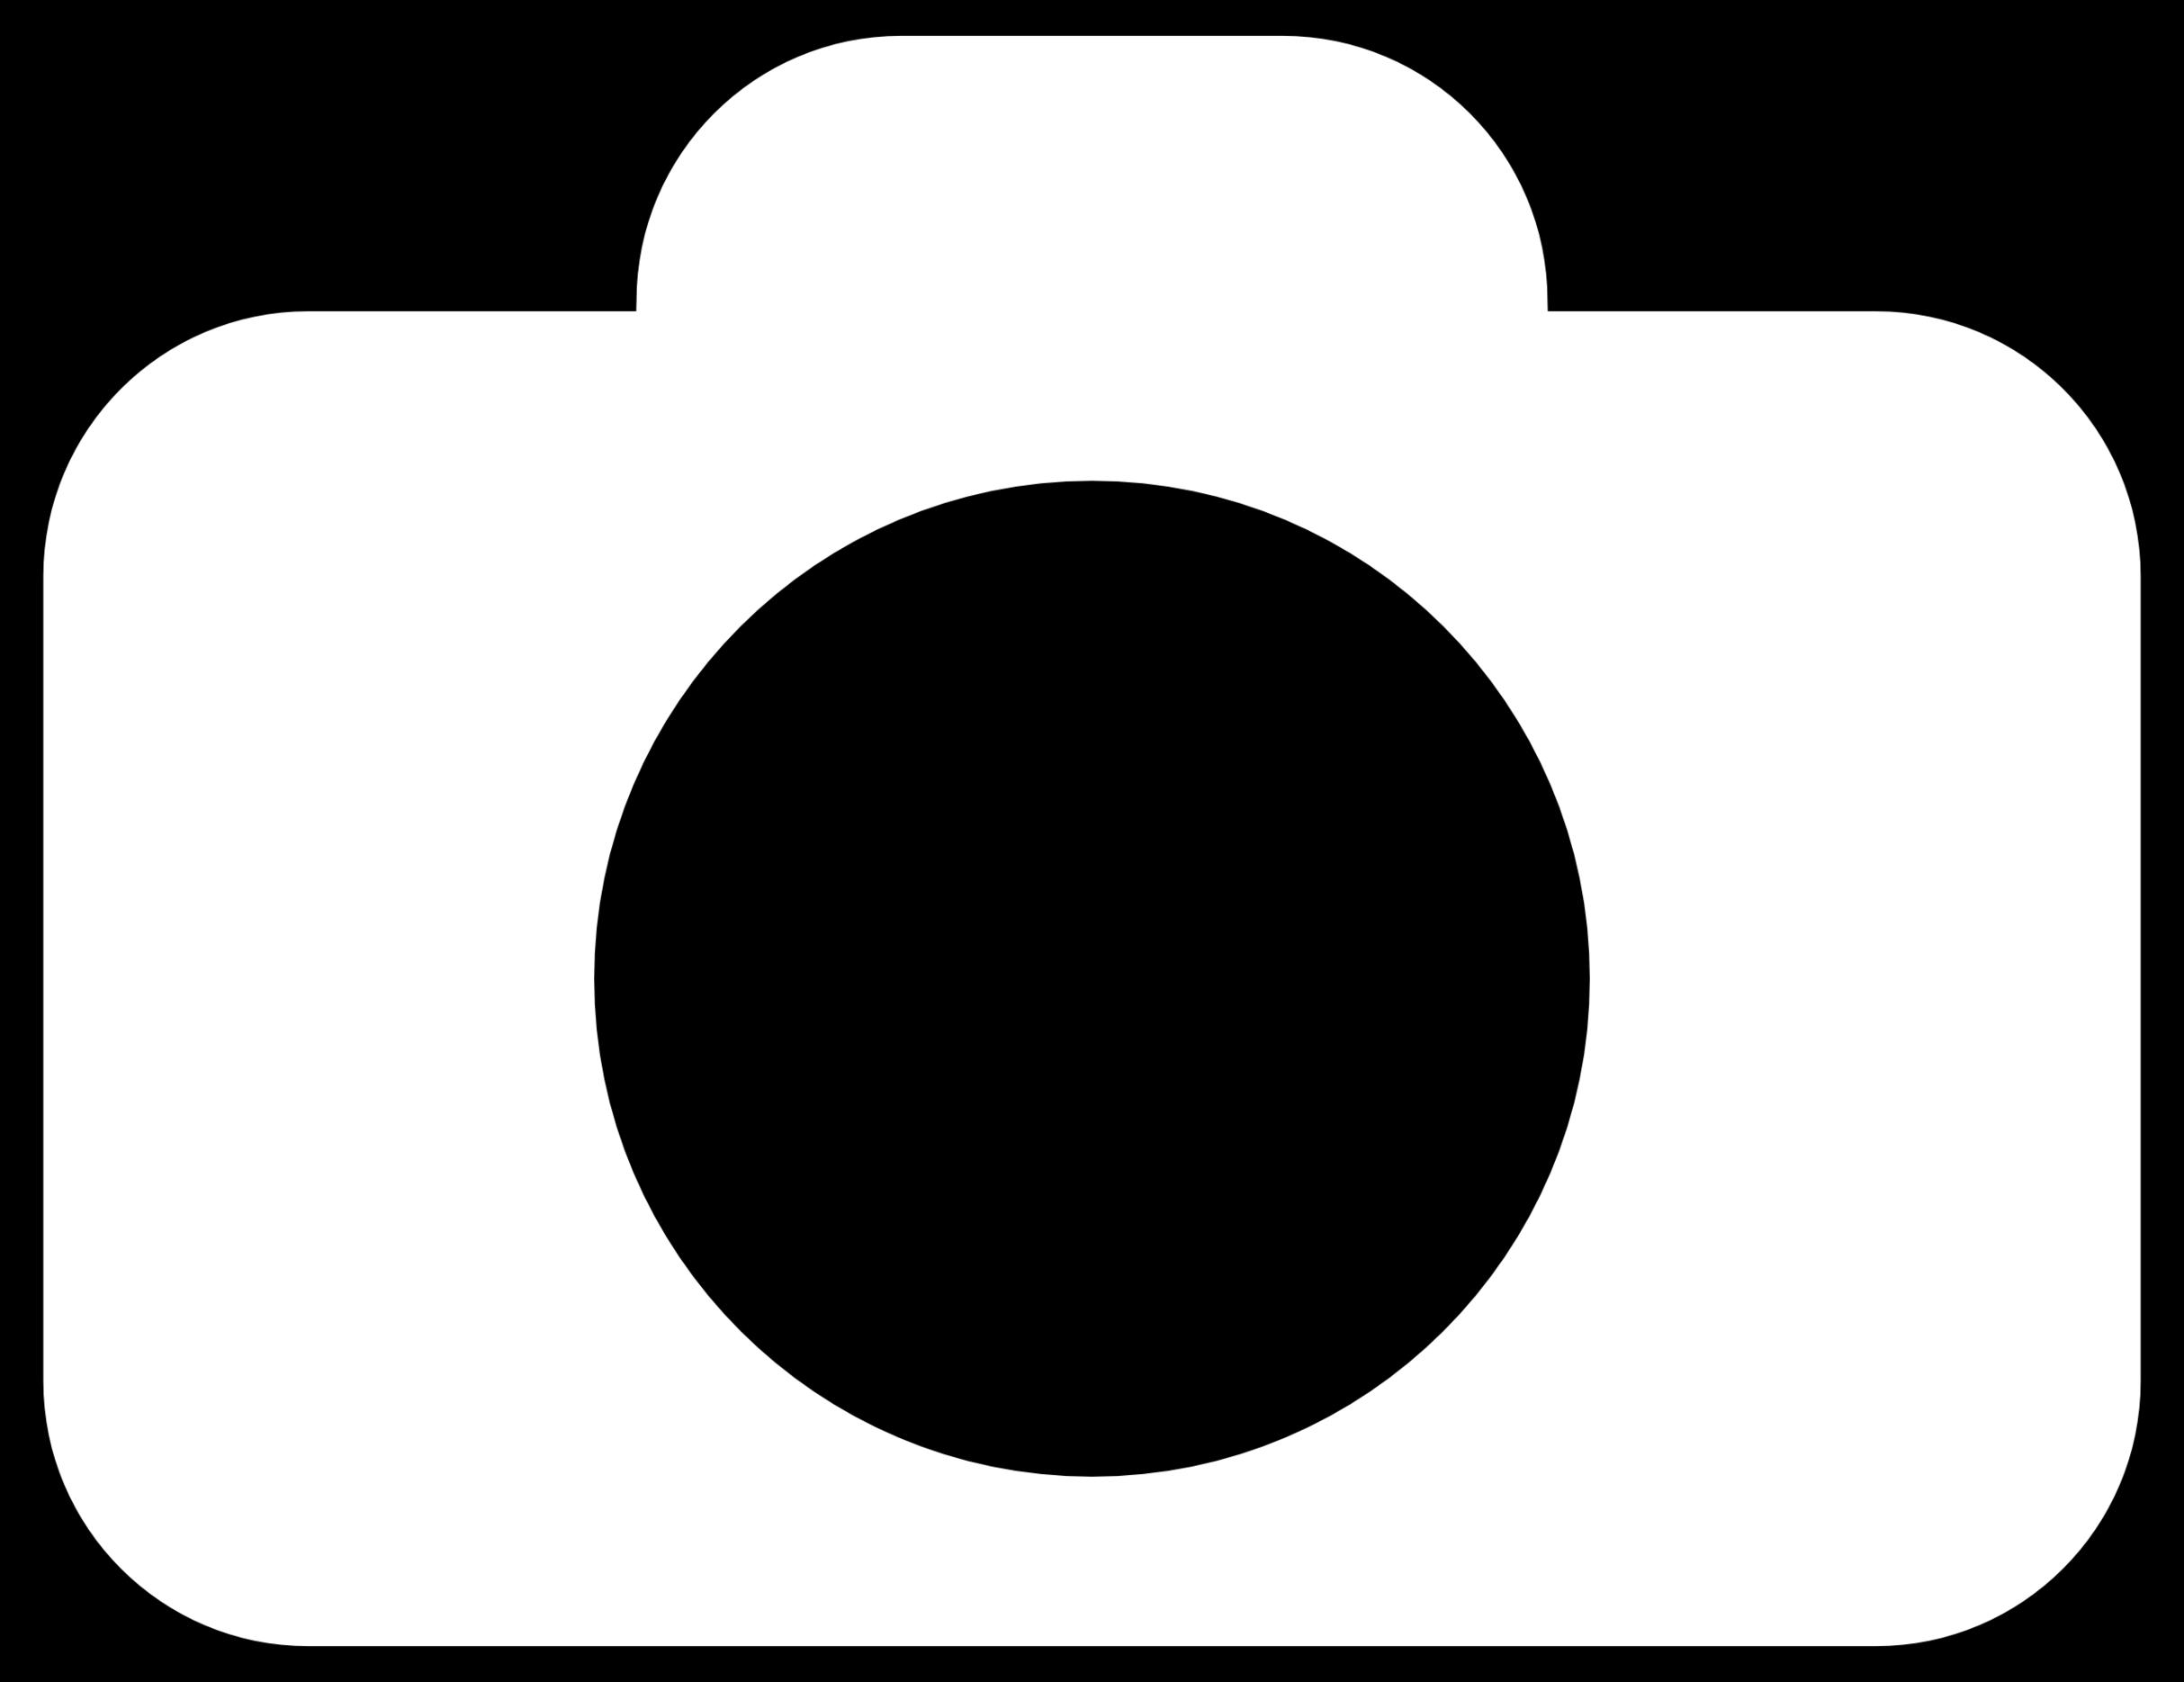 free camera clipart black and white - photo #24